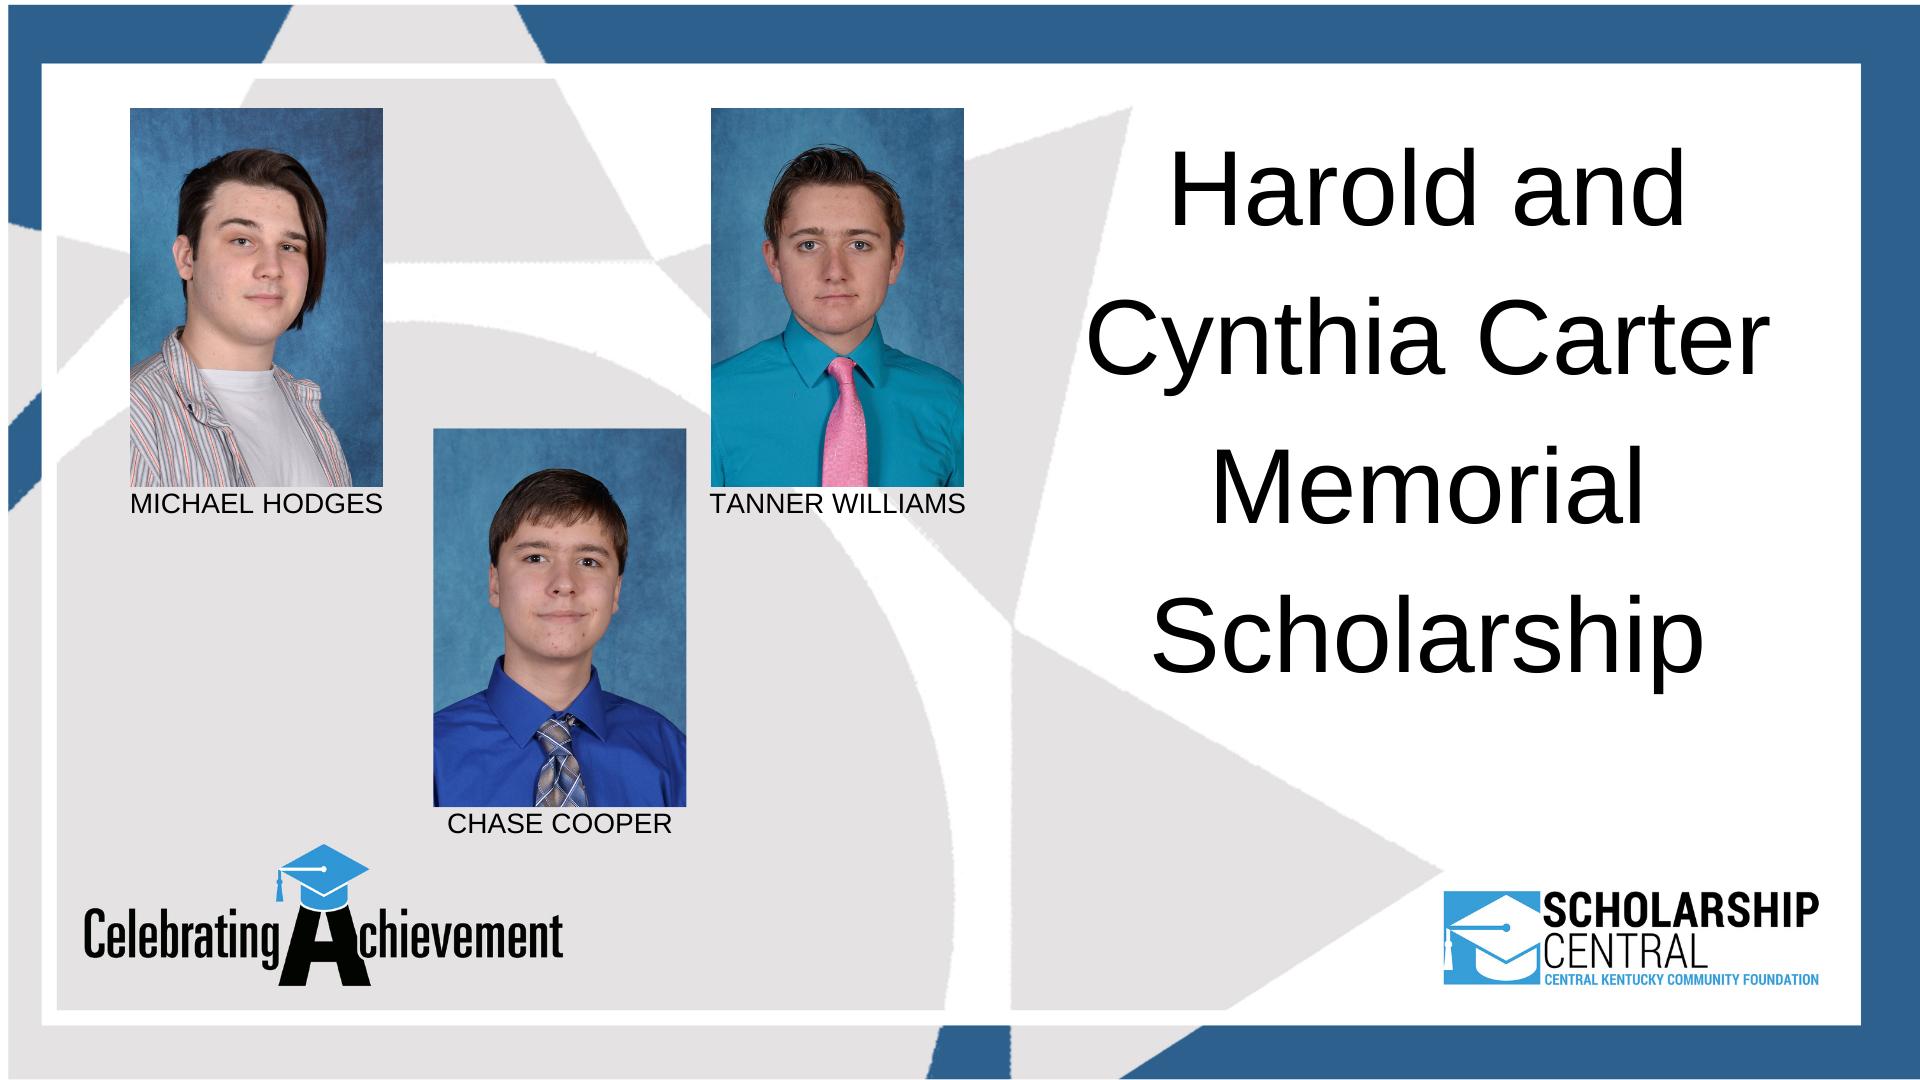 Harold and Cynthia Carter Memorial Scholarship Winners 2